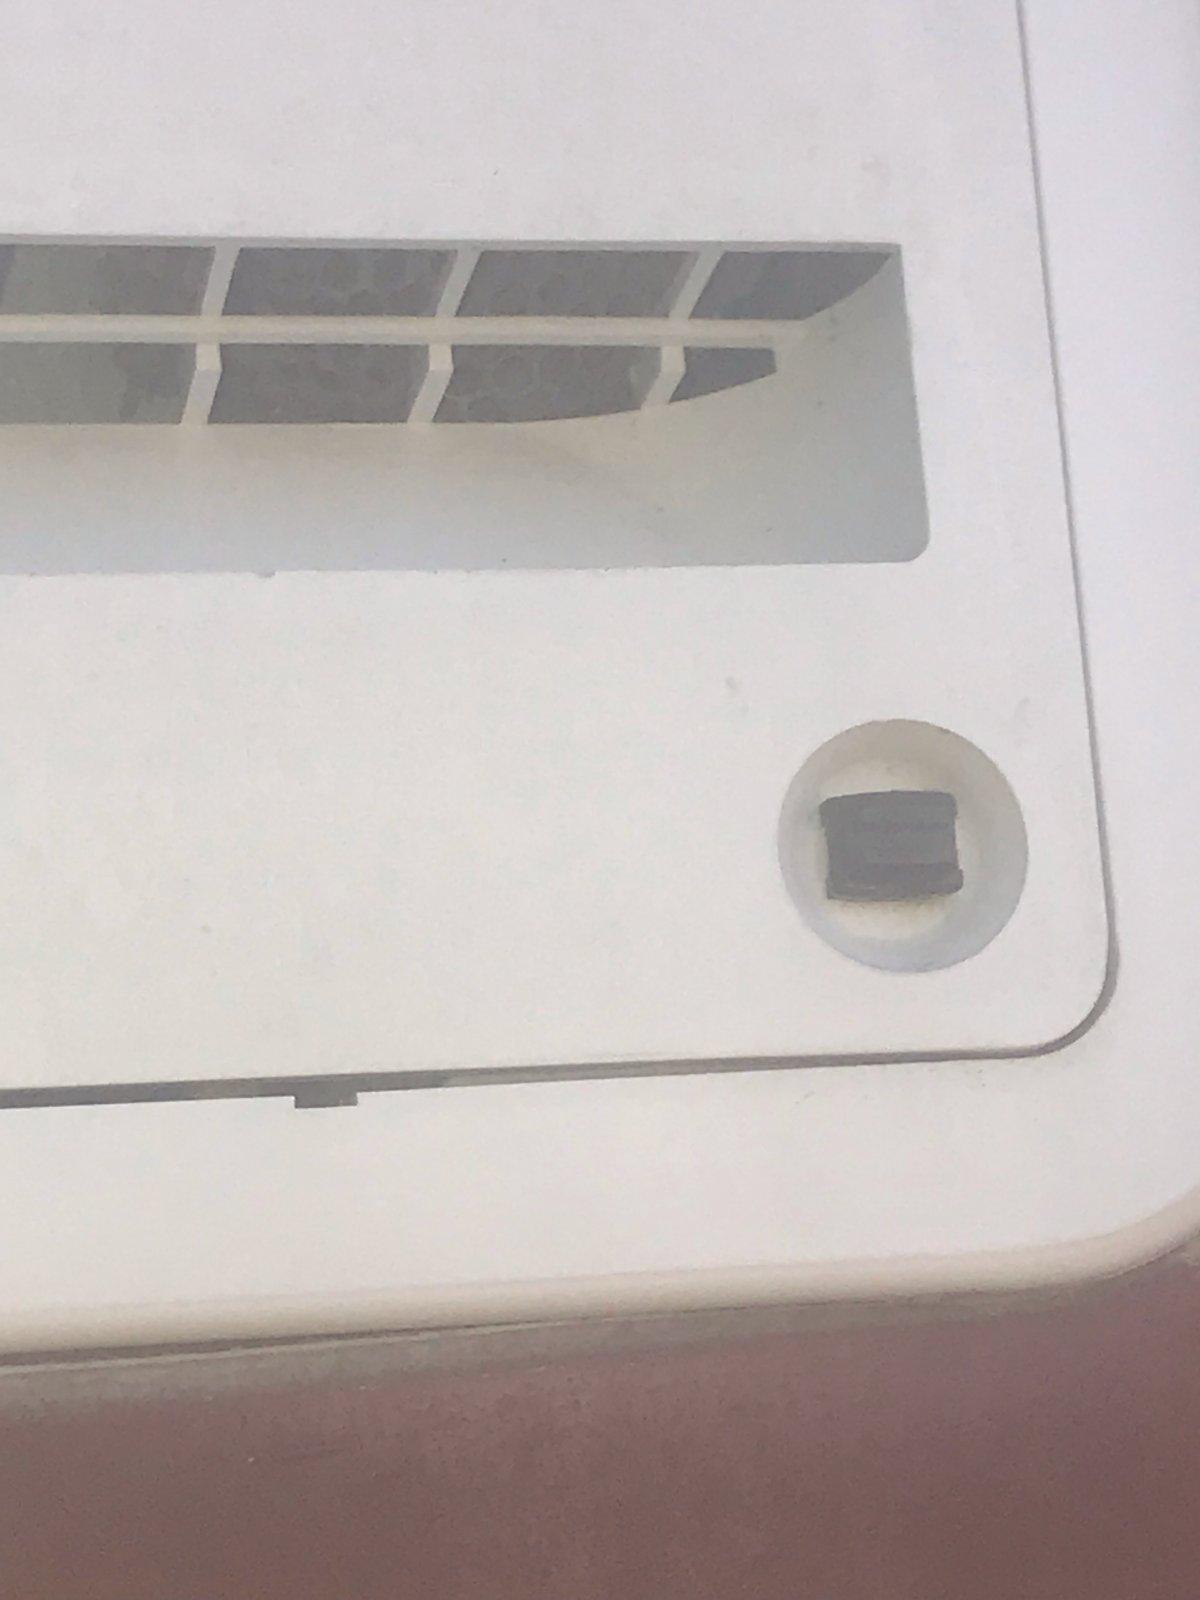 Click image for larger version  Name:fridge vent.jpg Views:42 Size:114.2 KB ID:238653